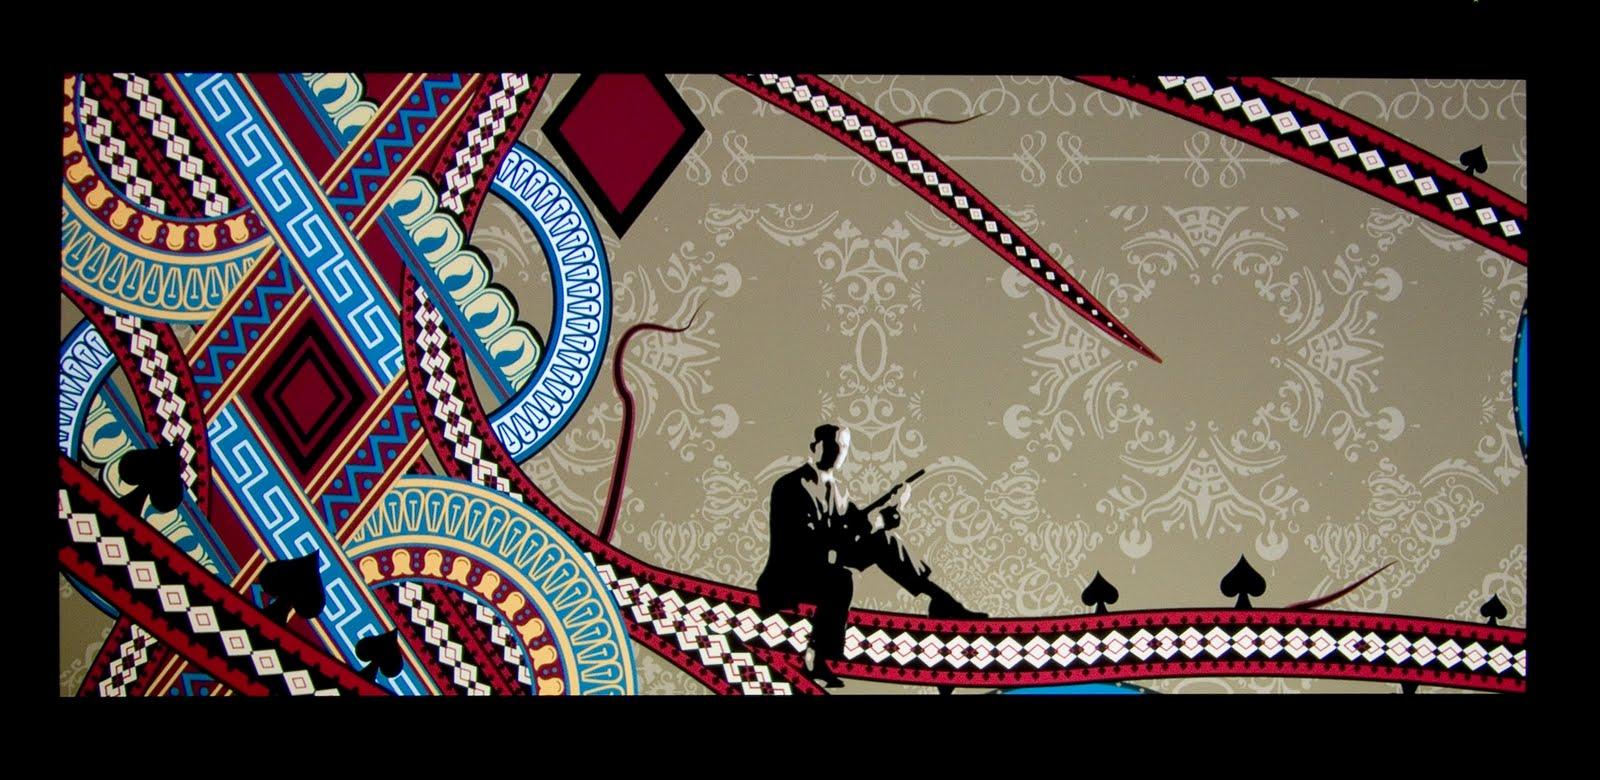 Casino royale opening credits music harrah casino kans city